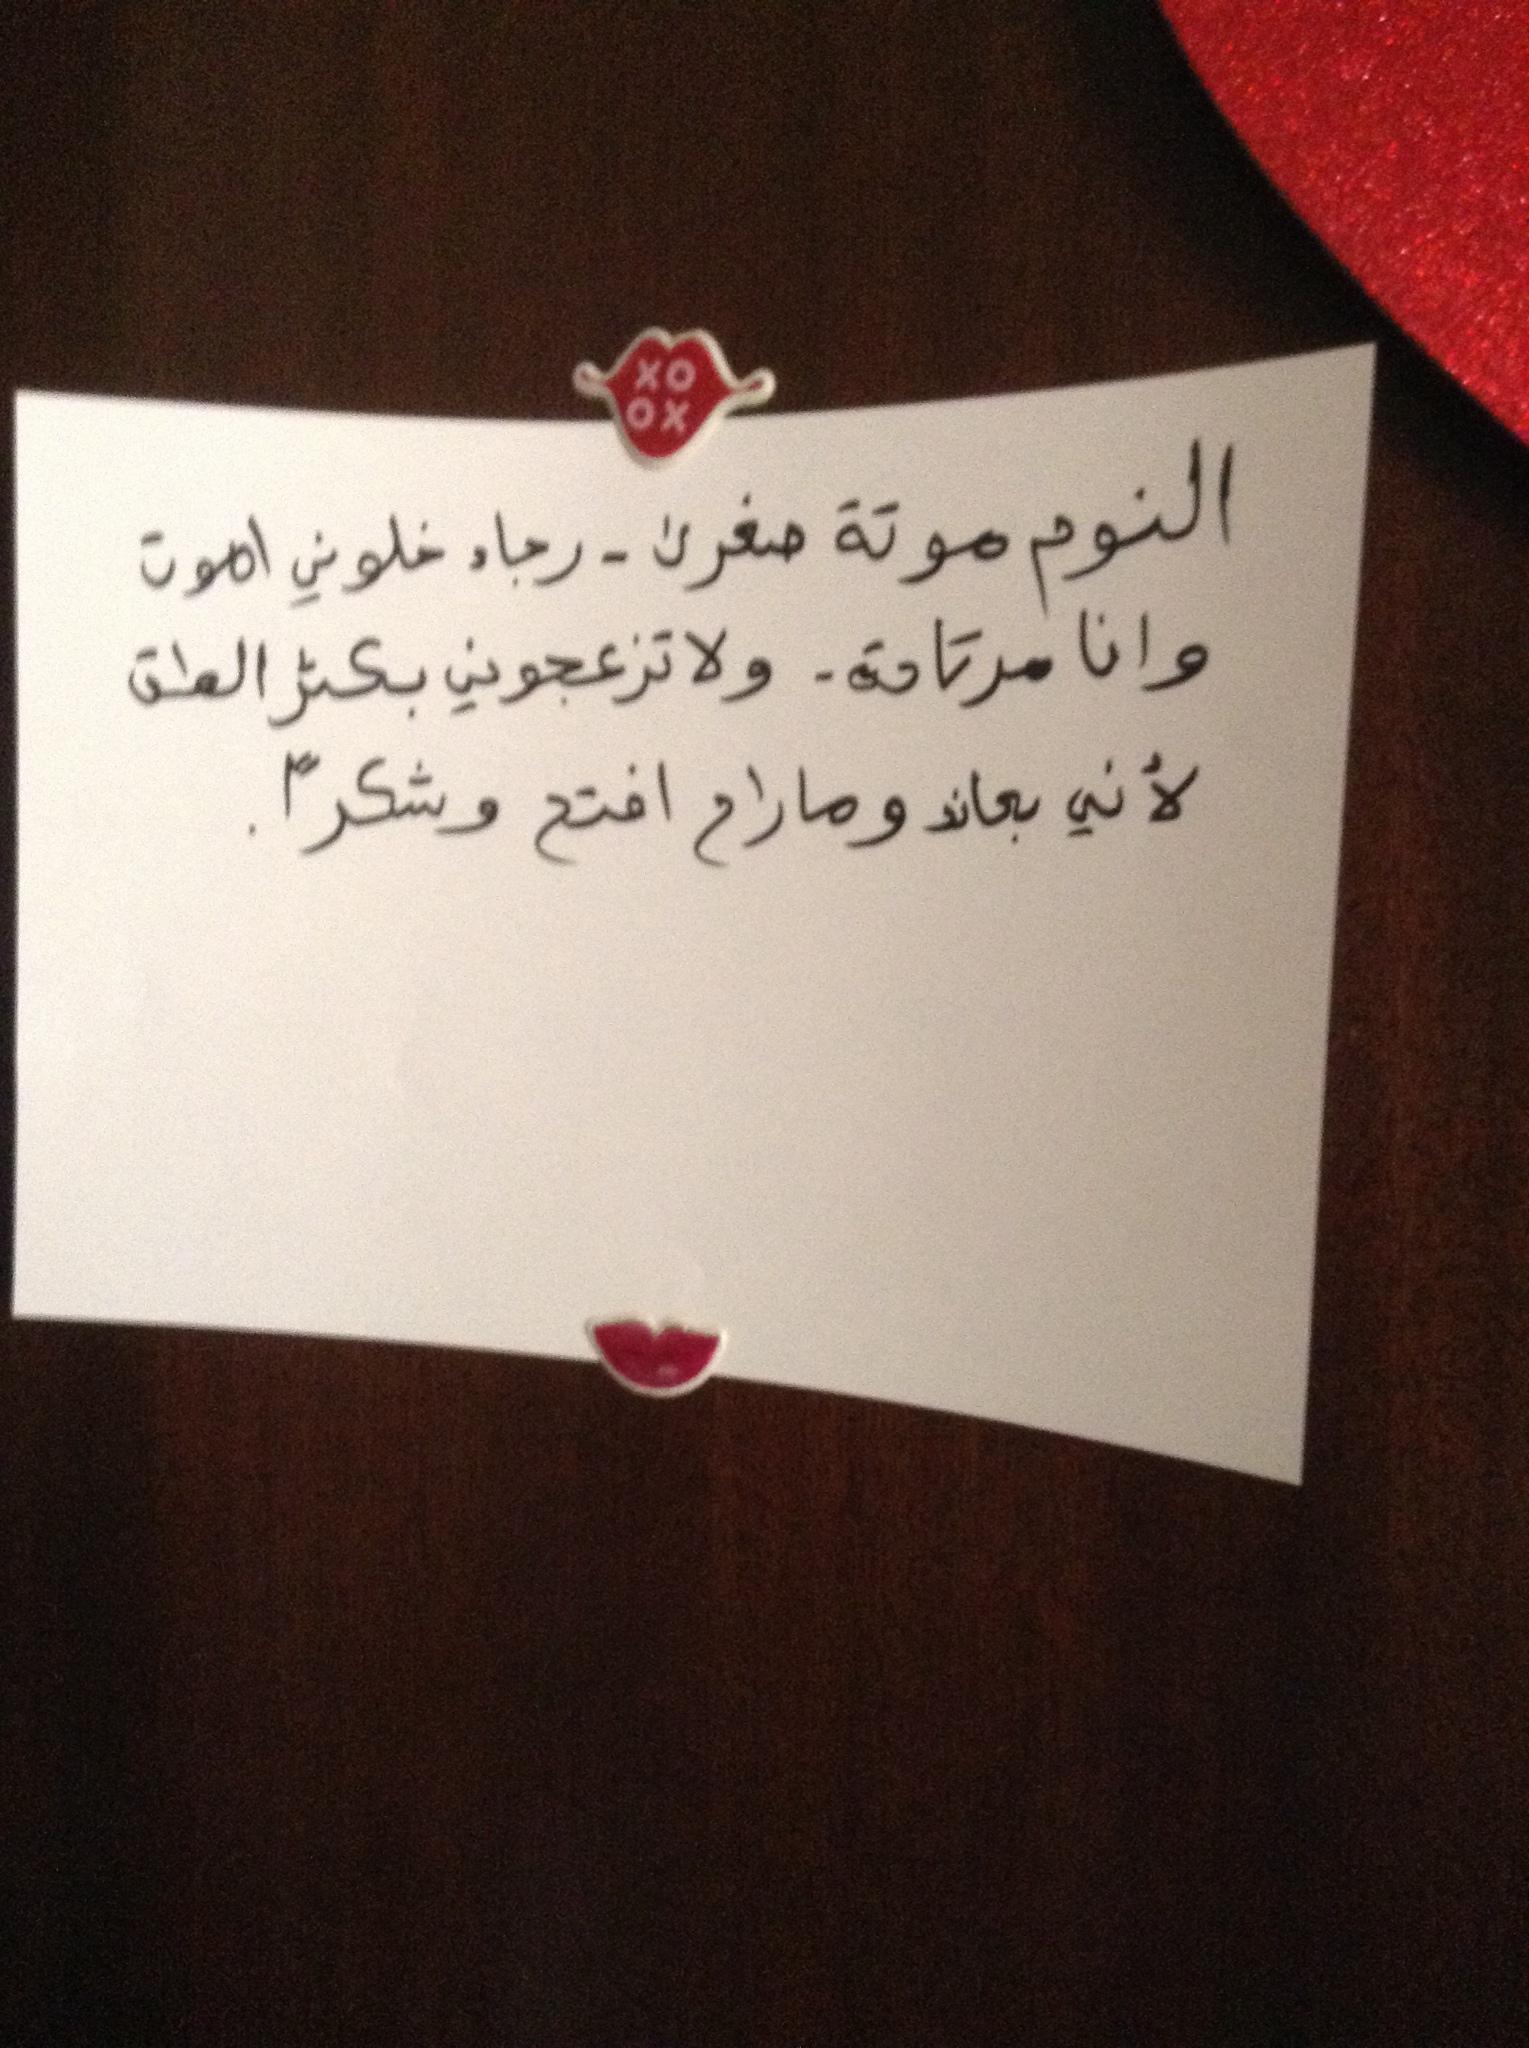 RT @abuabdelelah: ????? ???? ?????? ????? ??? ??? ???? ????? ! http://t.co/Jit4gc5ATl